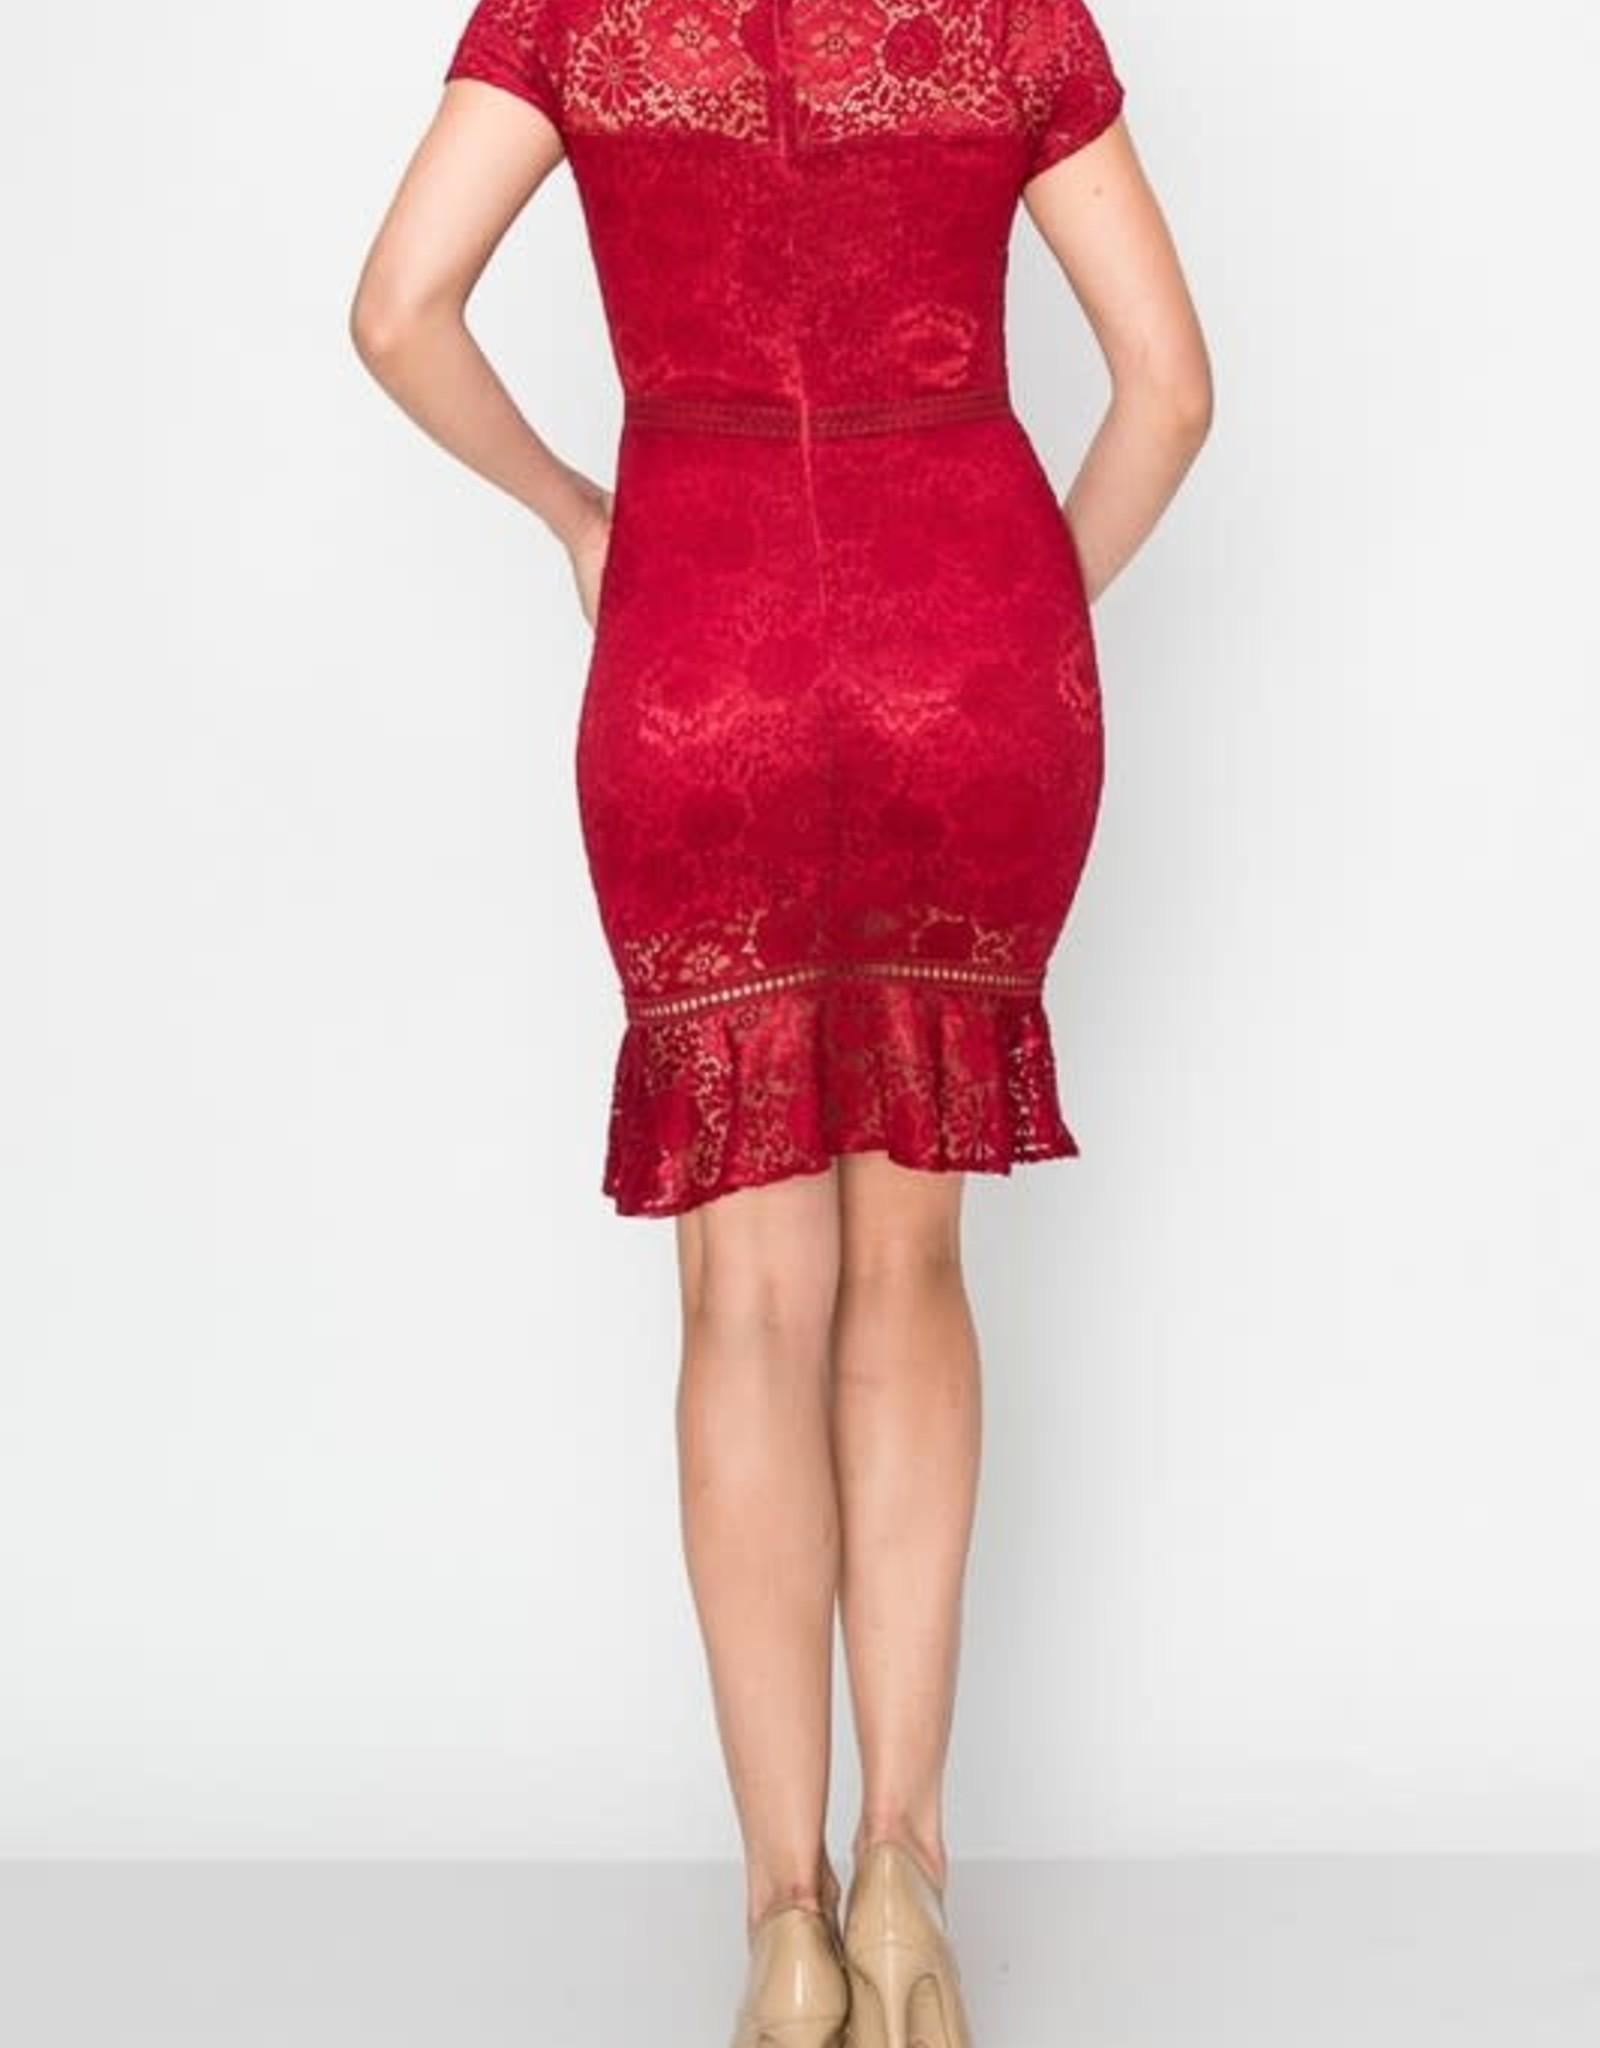 Not My Type Crochet Dress